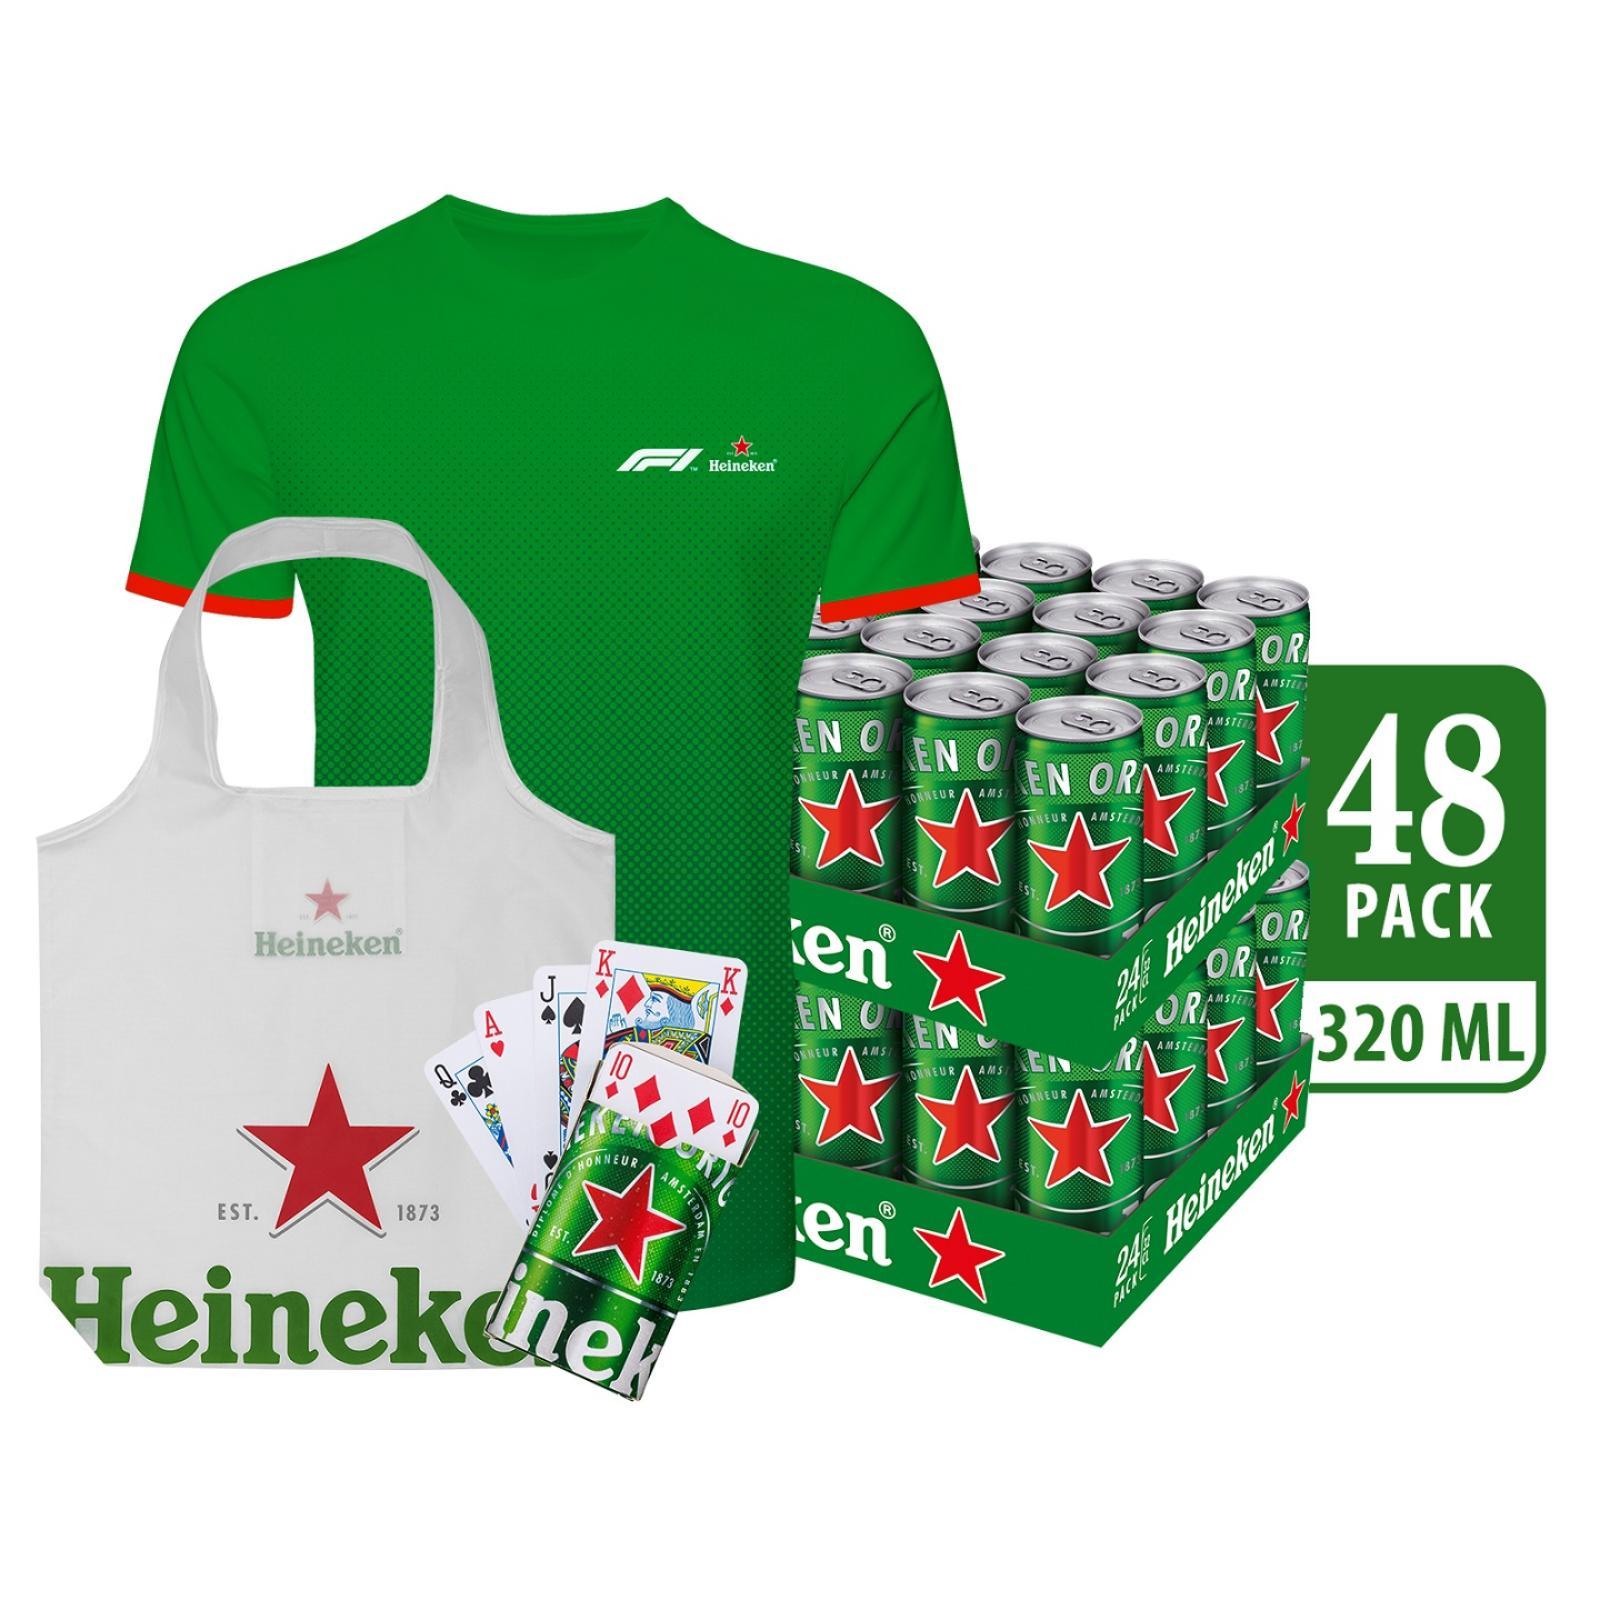 Heineken Lager Beer Can 48 x 320ml - Case [FREE Merchandise Bundle Kit]